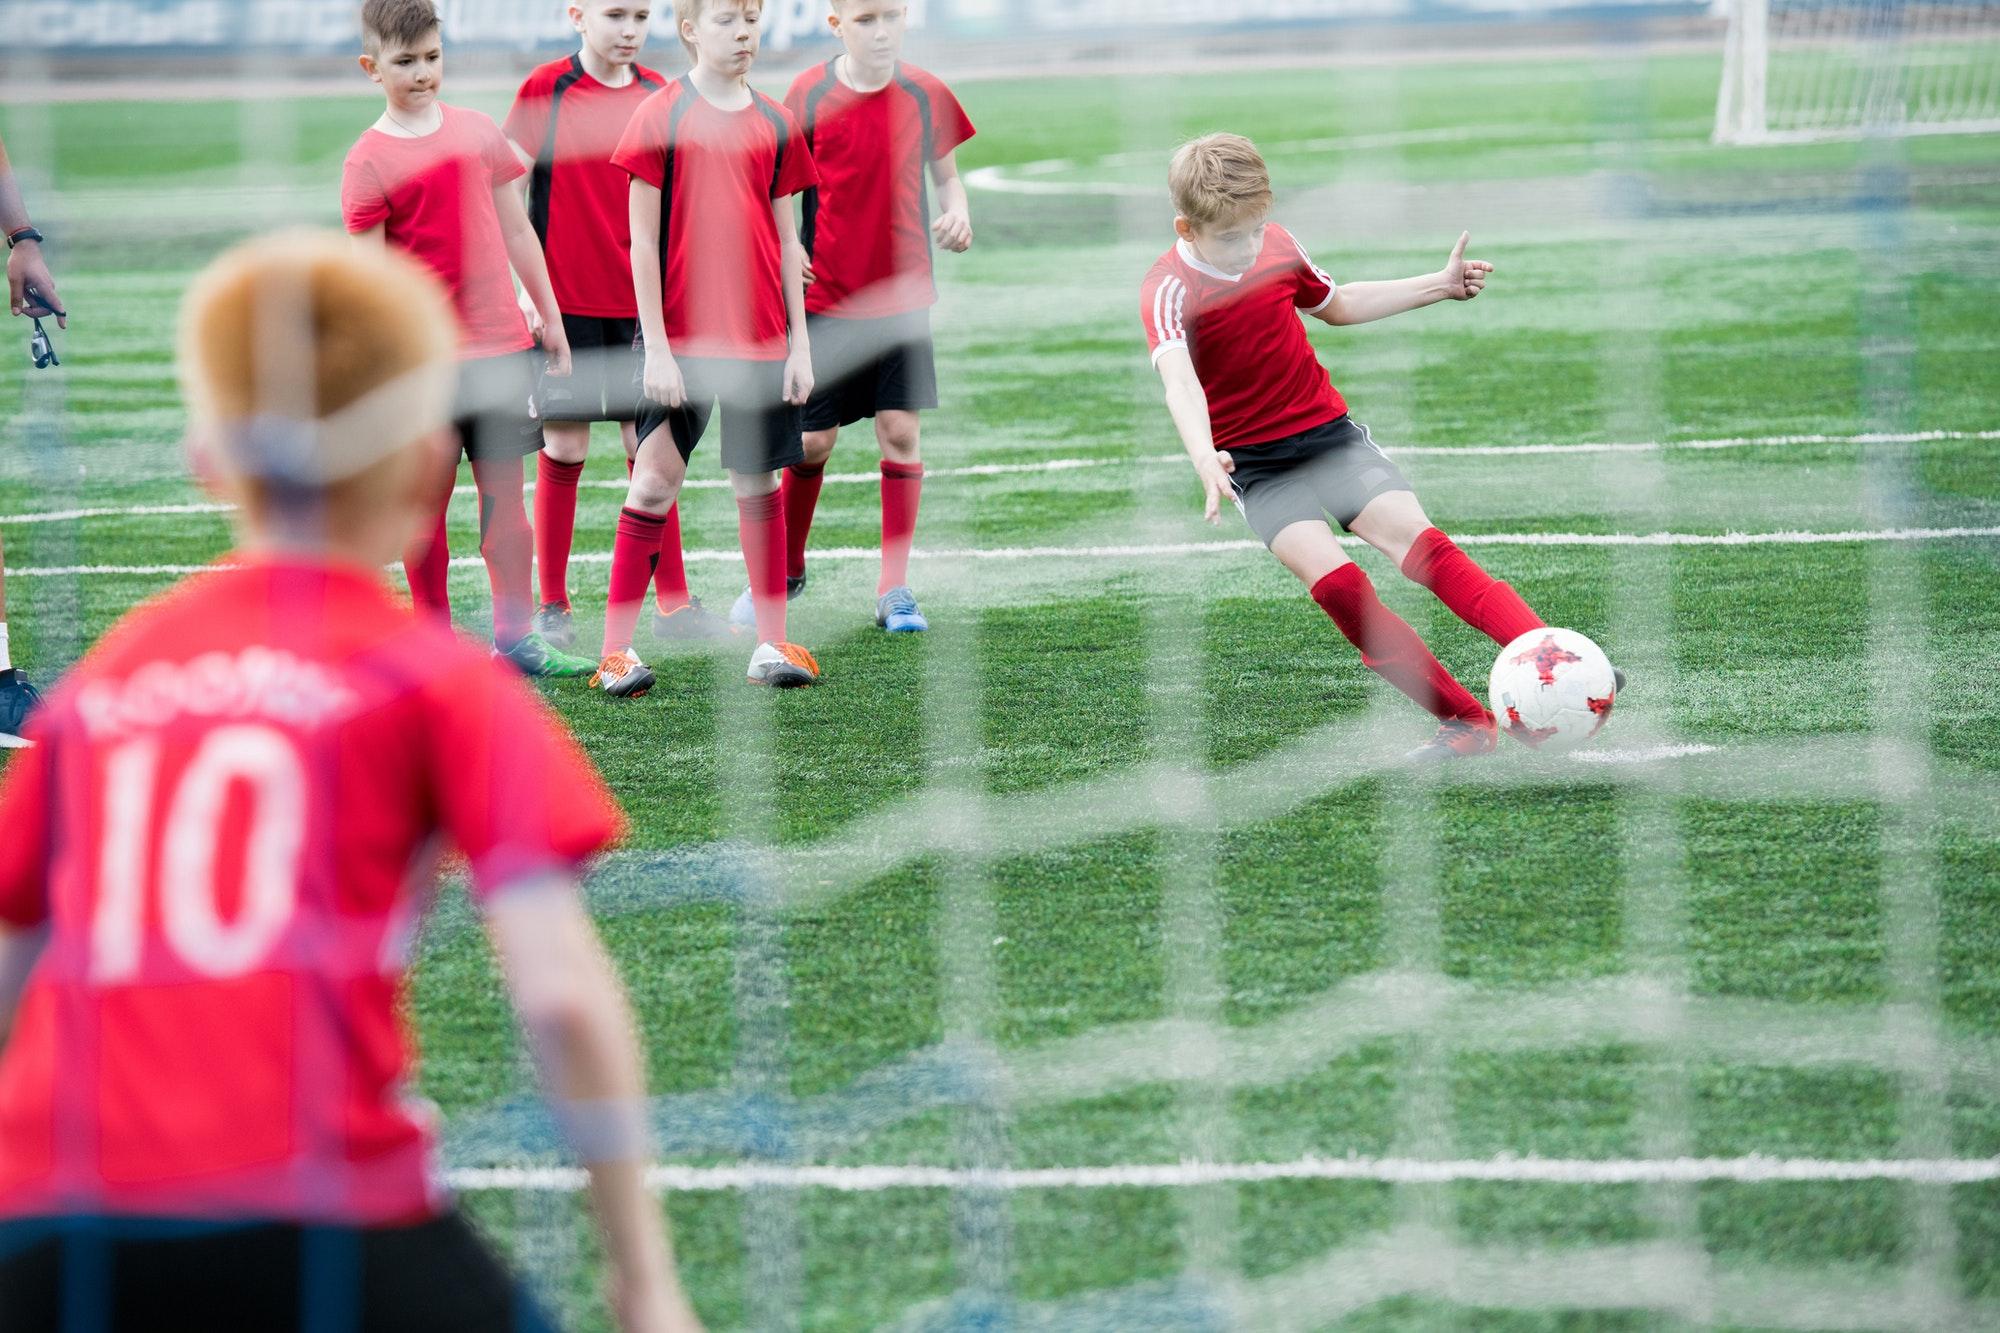 boy-scoring-goal.jpg